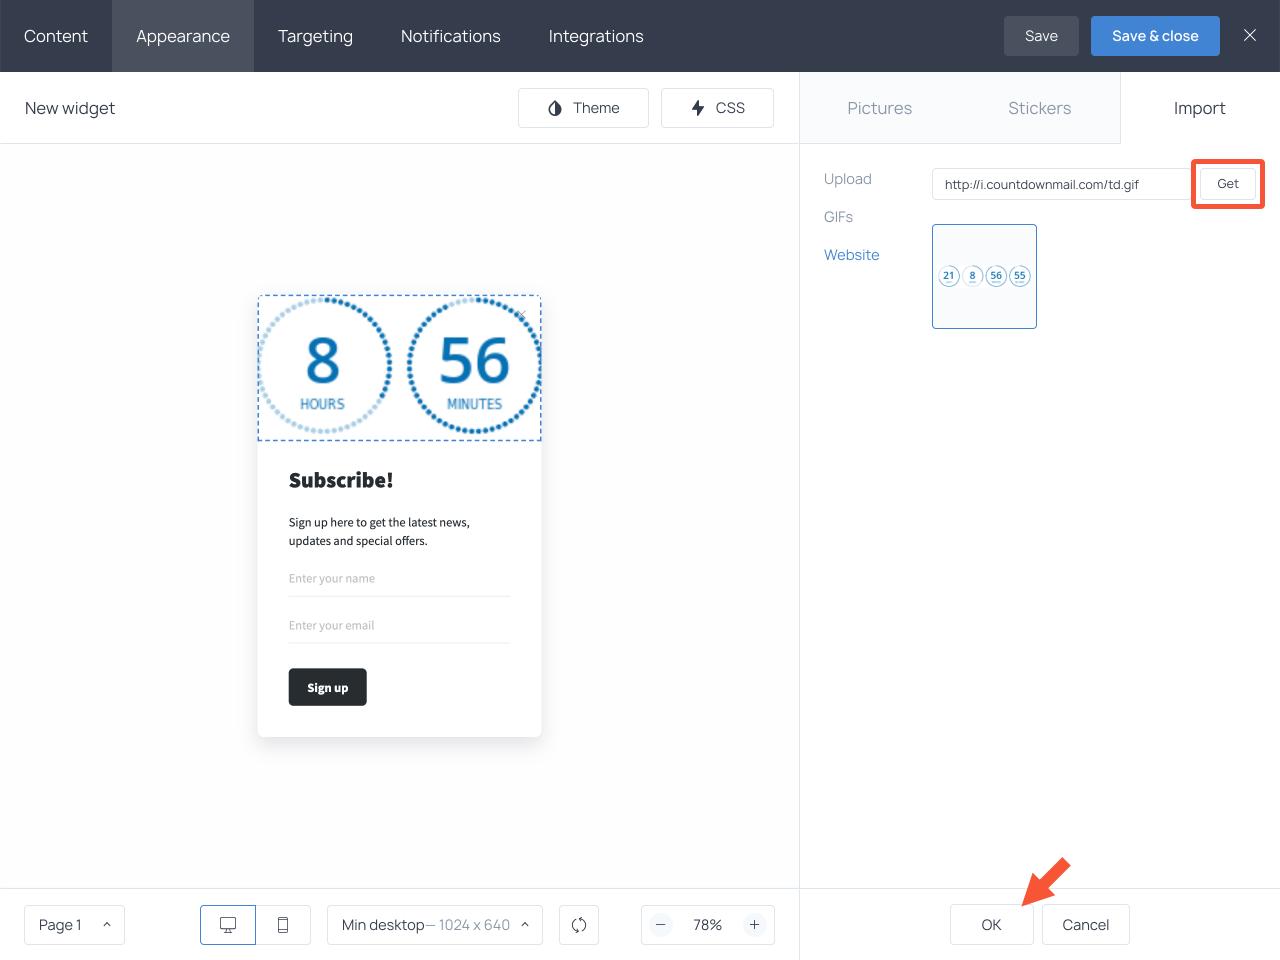 Choosing and saving the countdown image